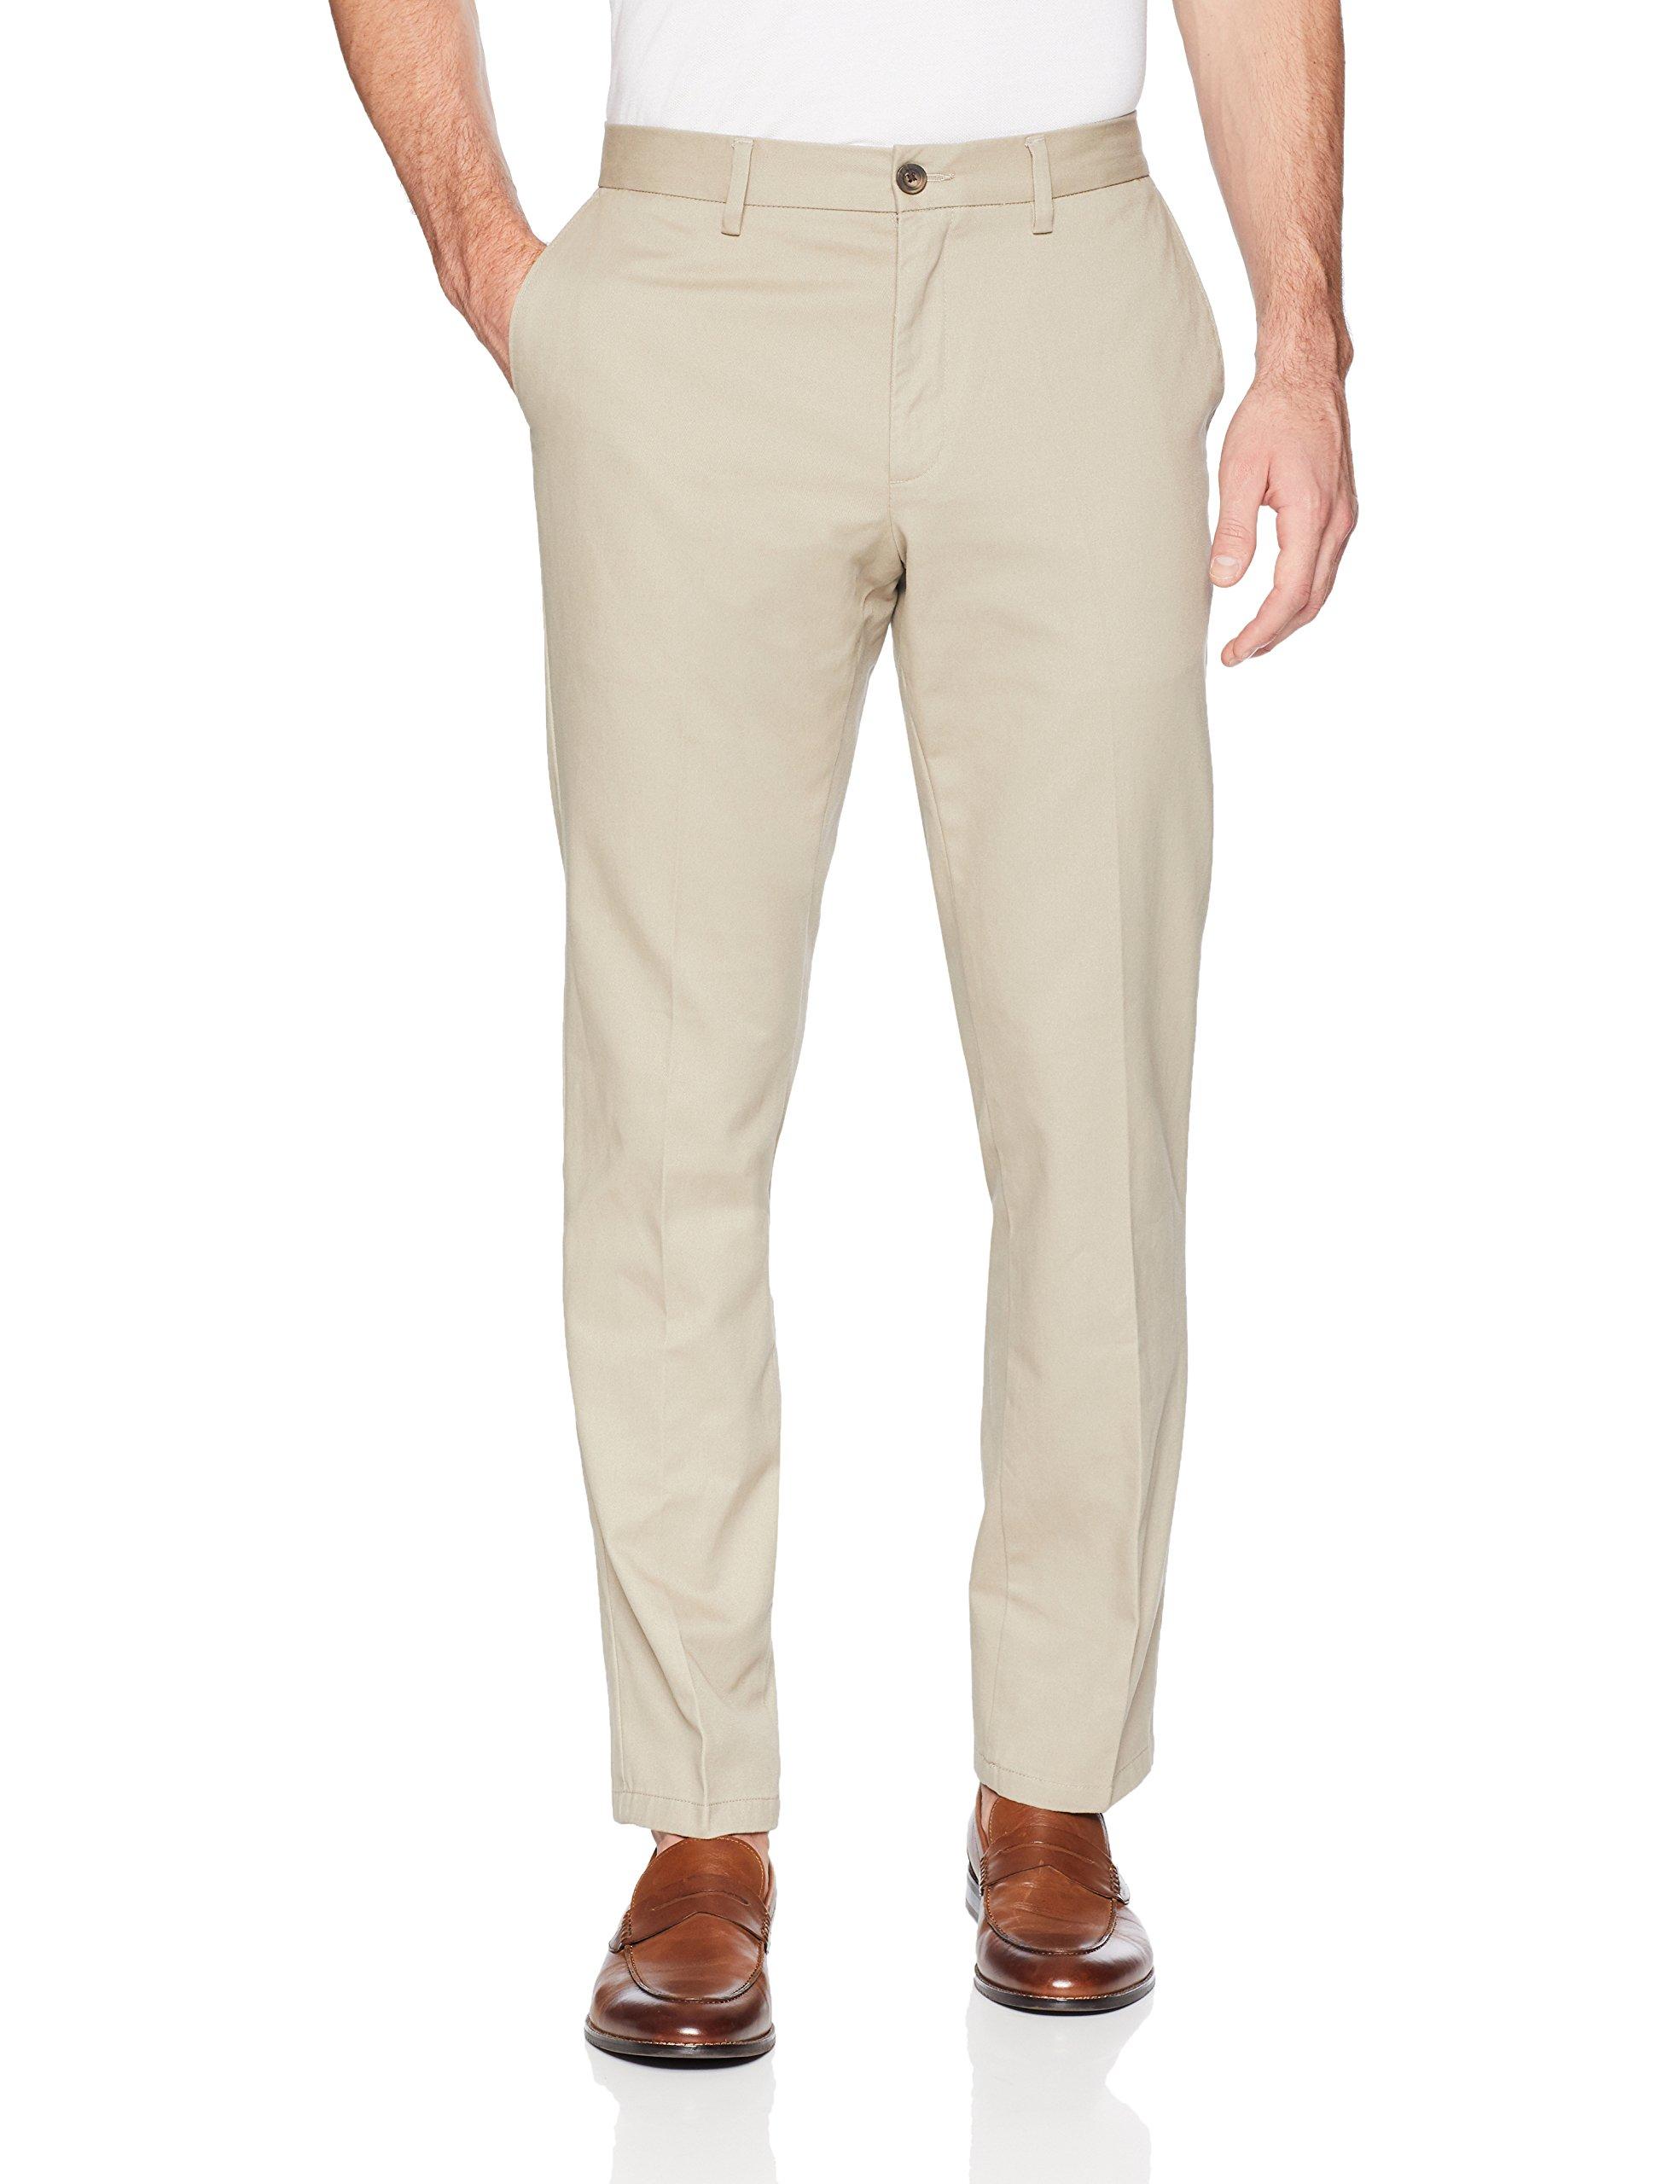 Amazon Essentials Men's Slim-Fit Wrinkle-Resistant Flat-Front Chino Pant, Khaki, 30W x 28L by Amazon Essentials